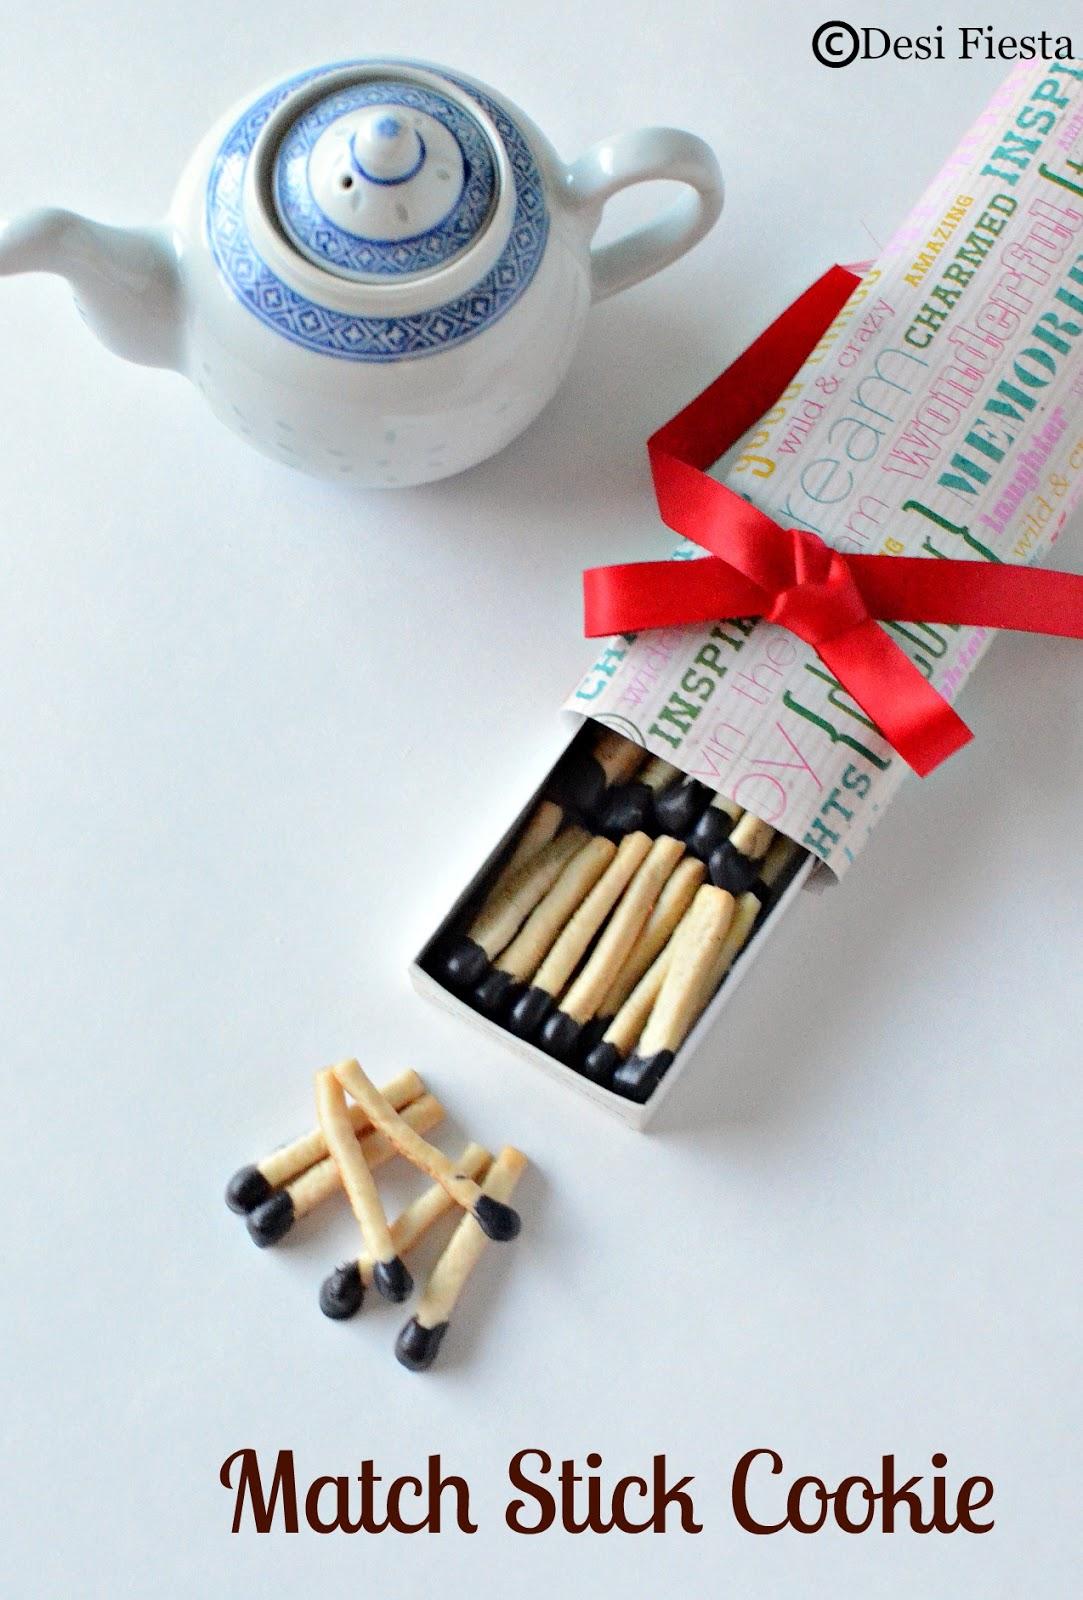 Eggless Match stick shaped Cookies